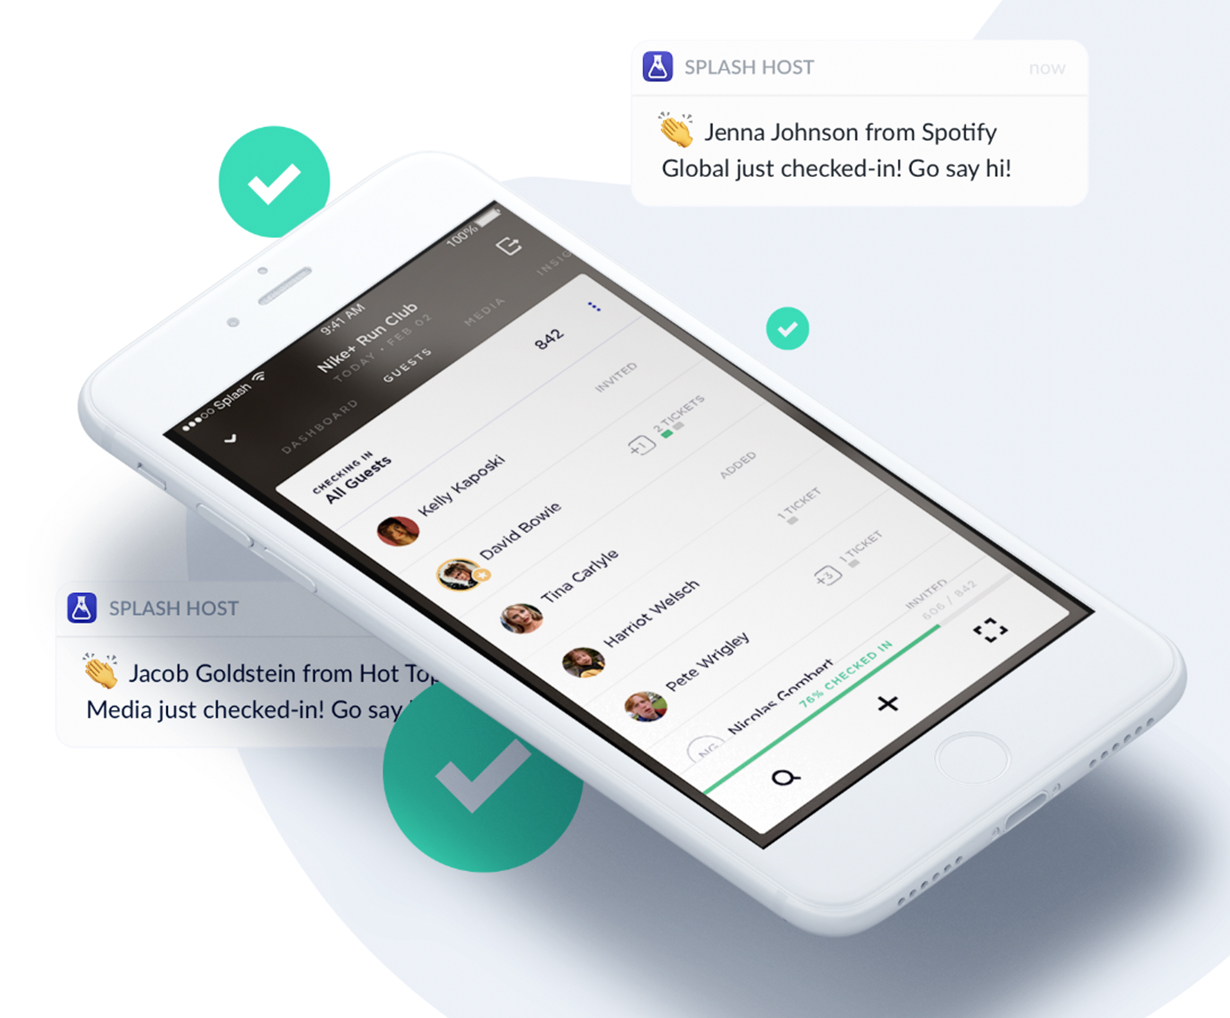 Splash Demo - The Splash Host app